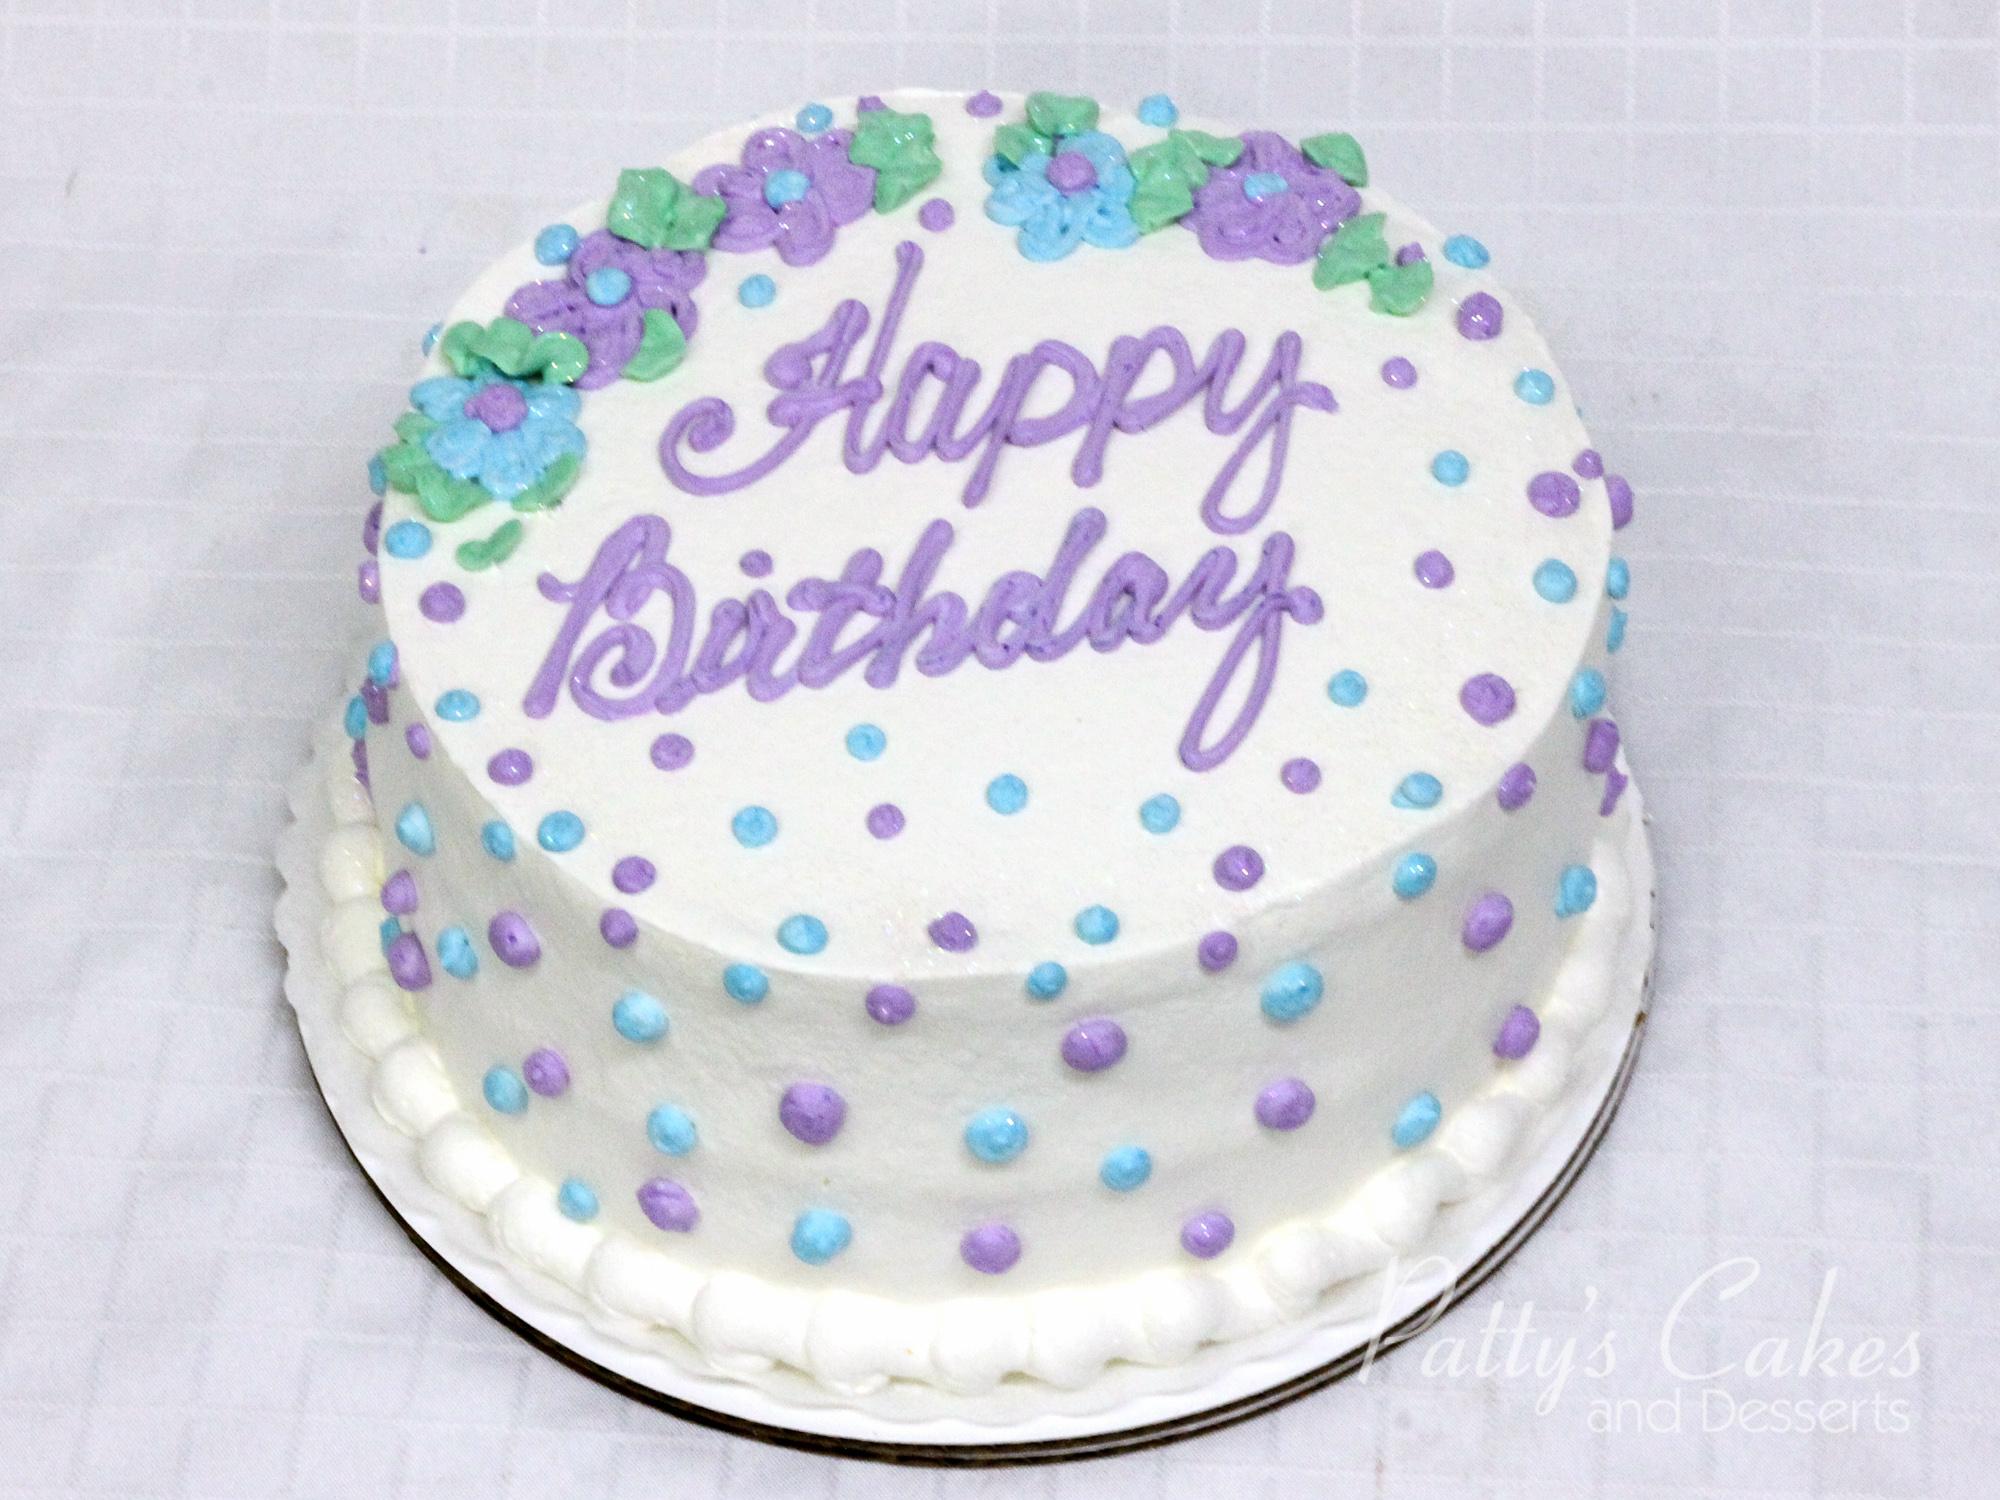 violet-blue-green-white-birthday-cake